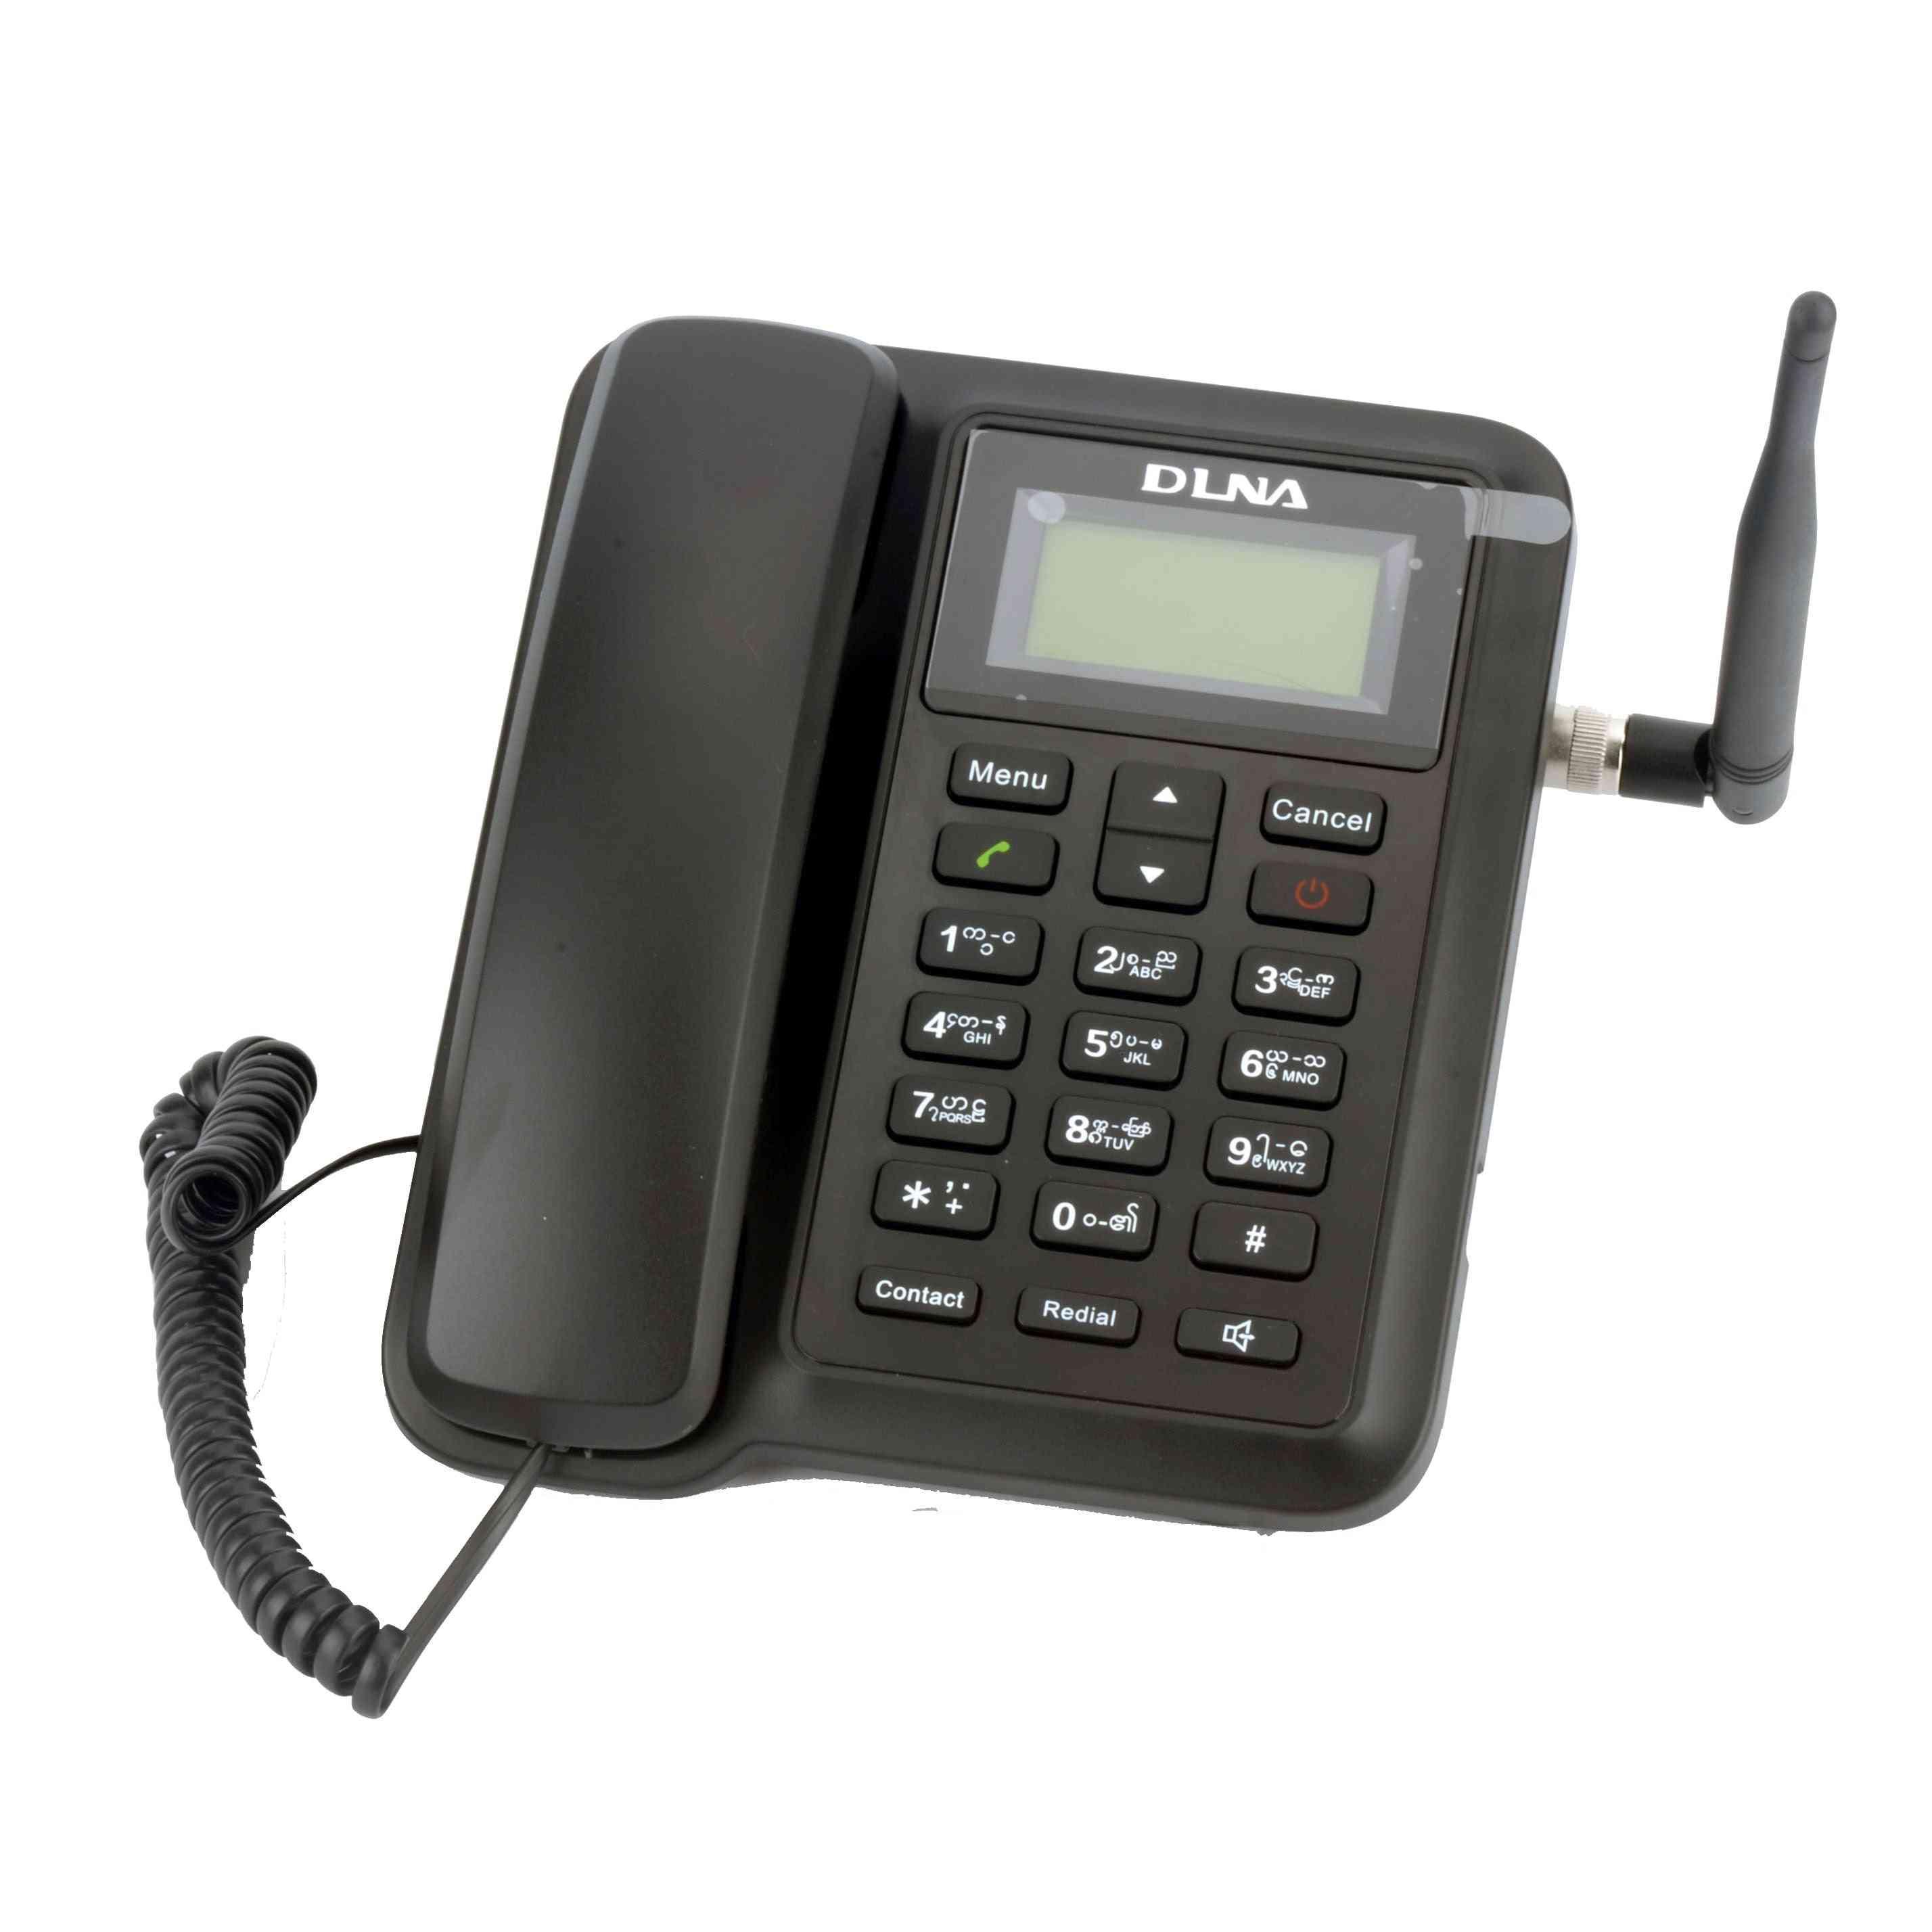 Gsm 850/900/1800/1900 Mhz Fixed Wireless Phone Desktop Cordless